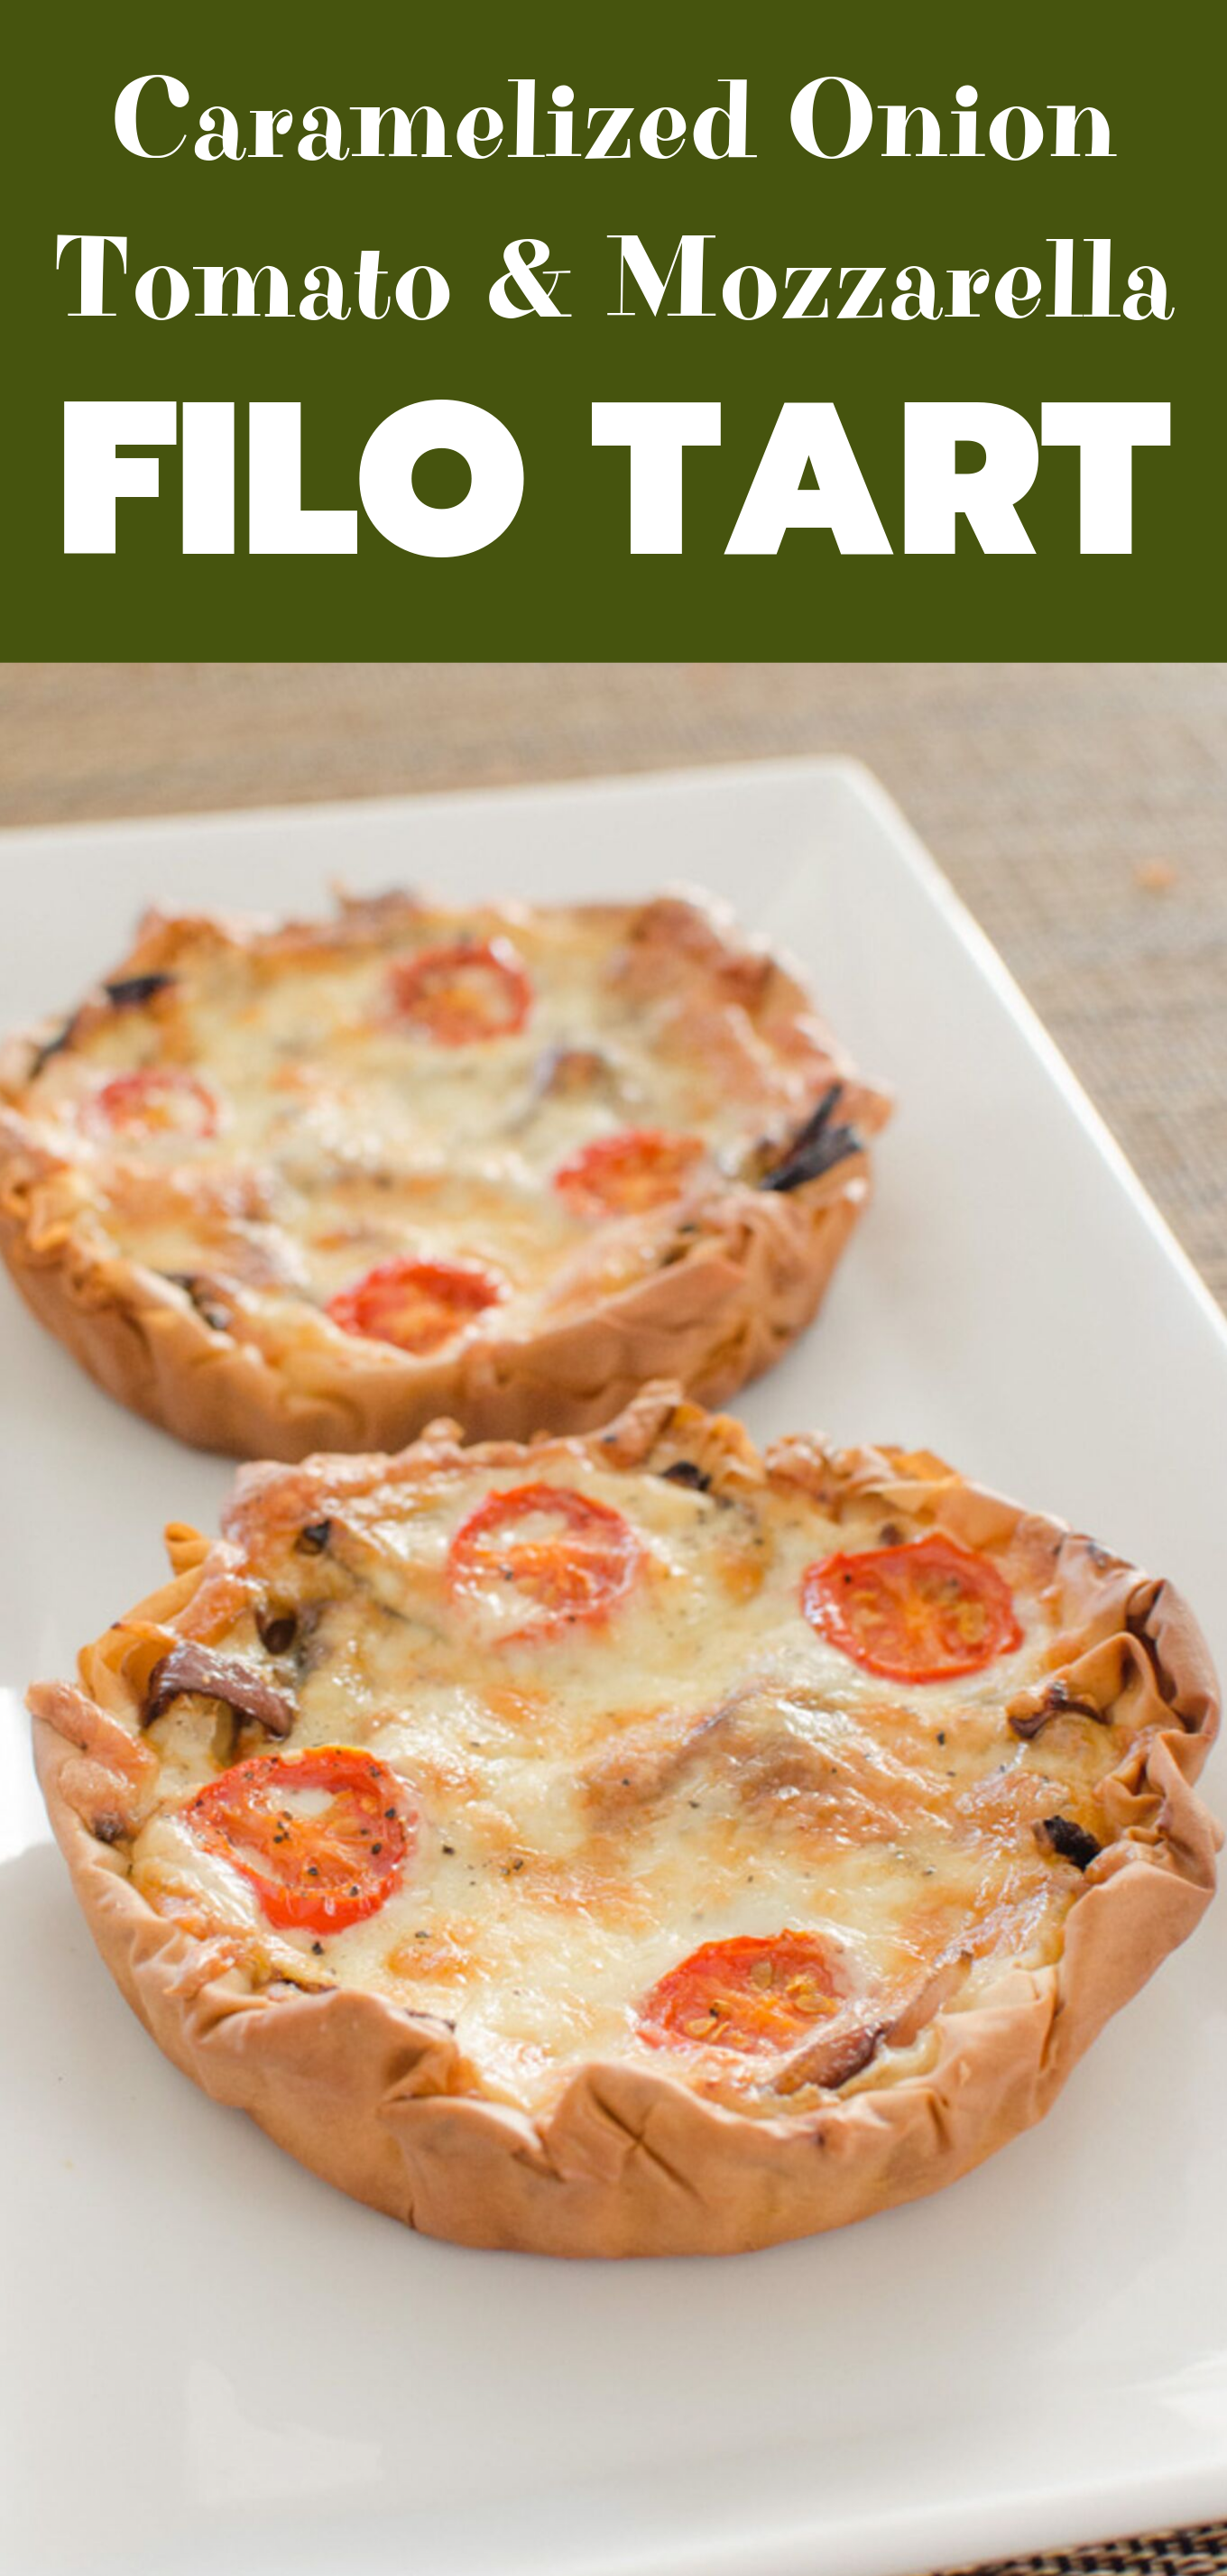 caramelized onion, tomato and mozzarella filo tart featured pin